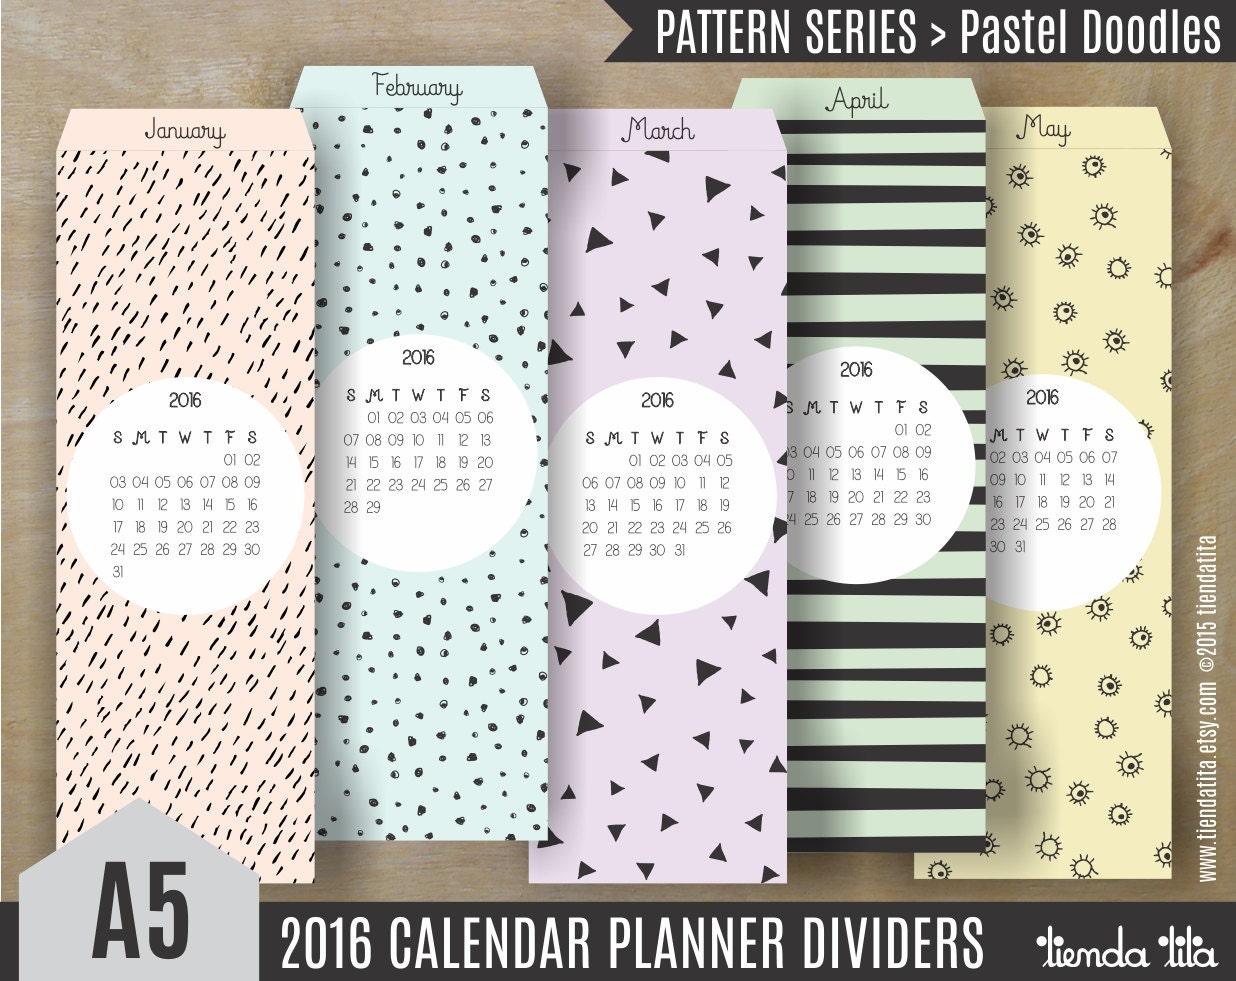 Calendar Bookmark : Sale off pastel doodles a calendar dividers